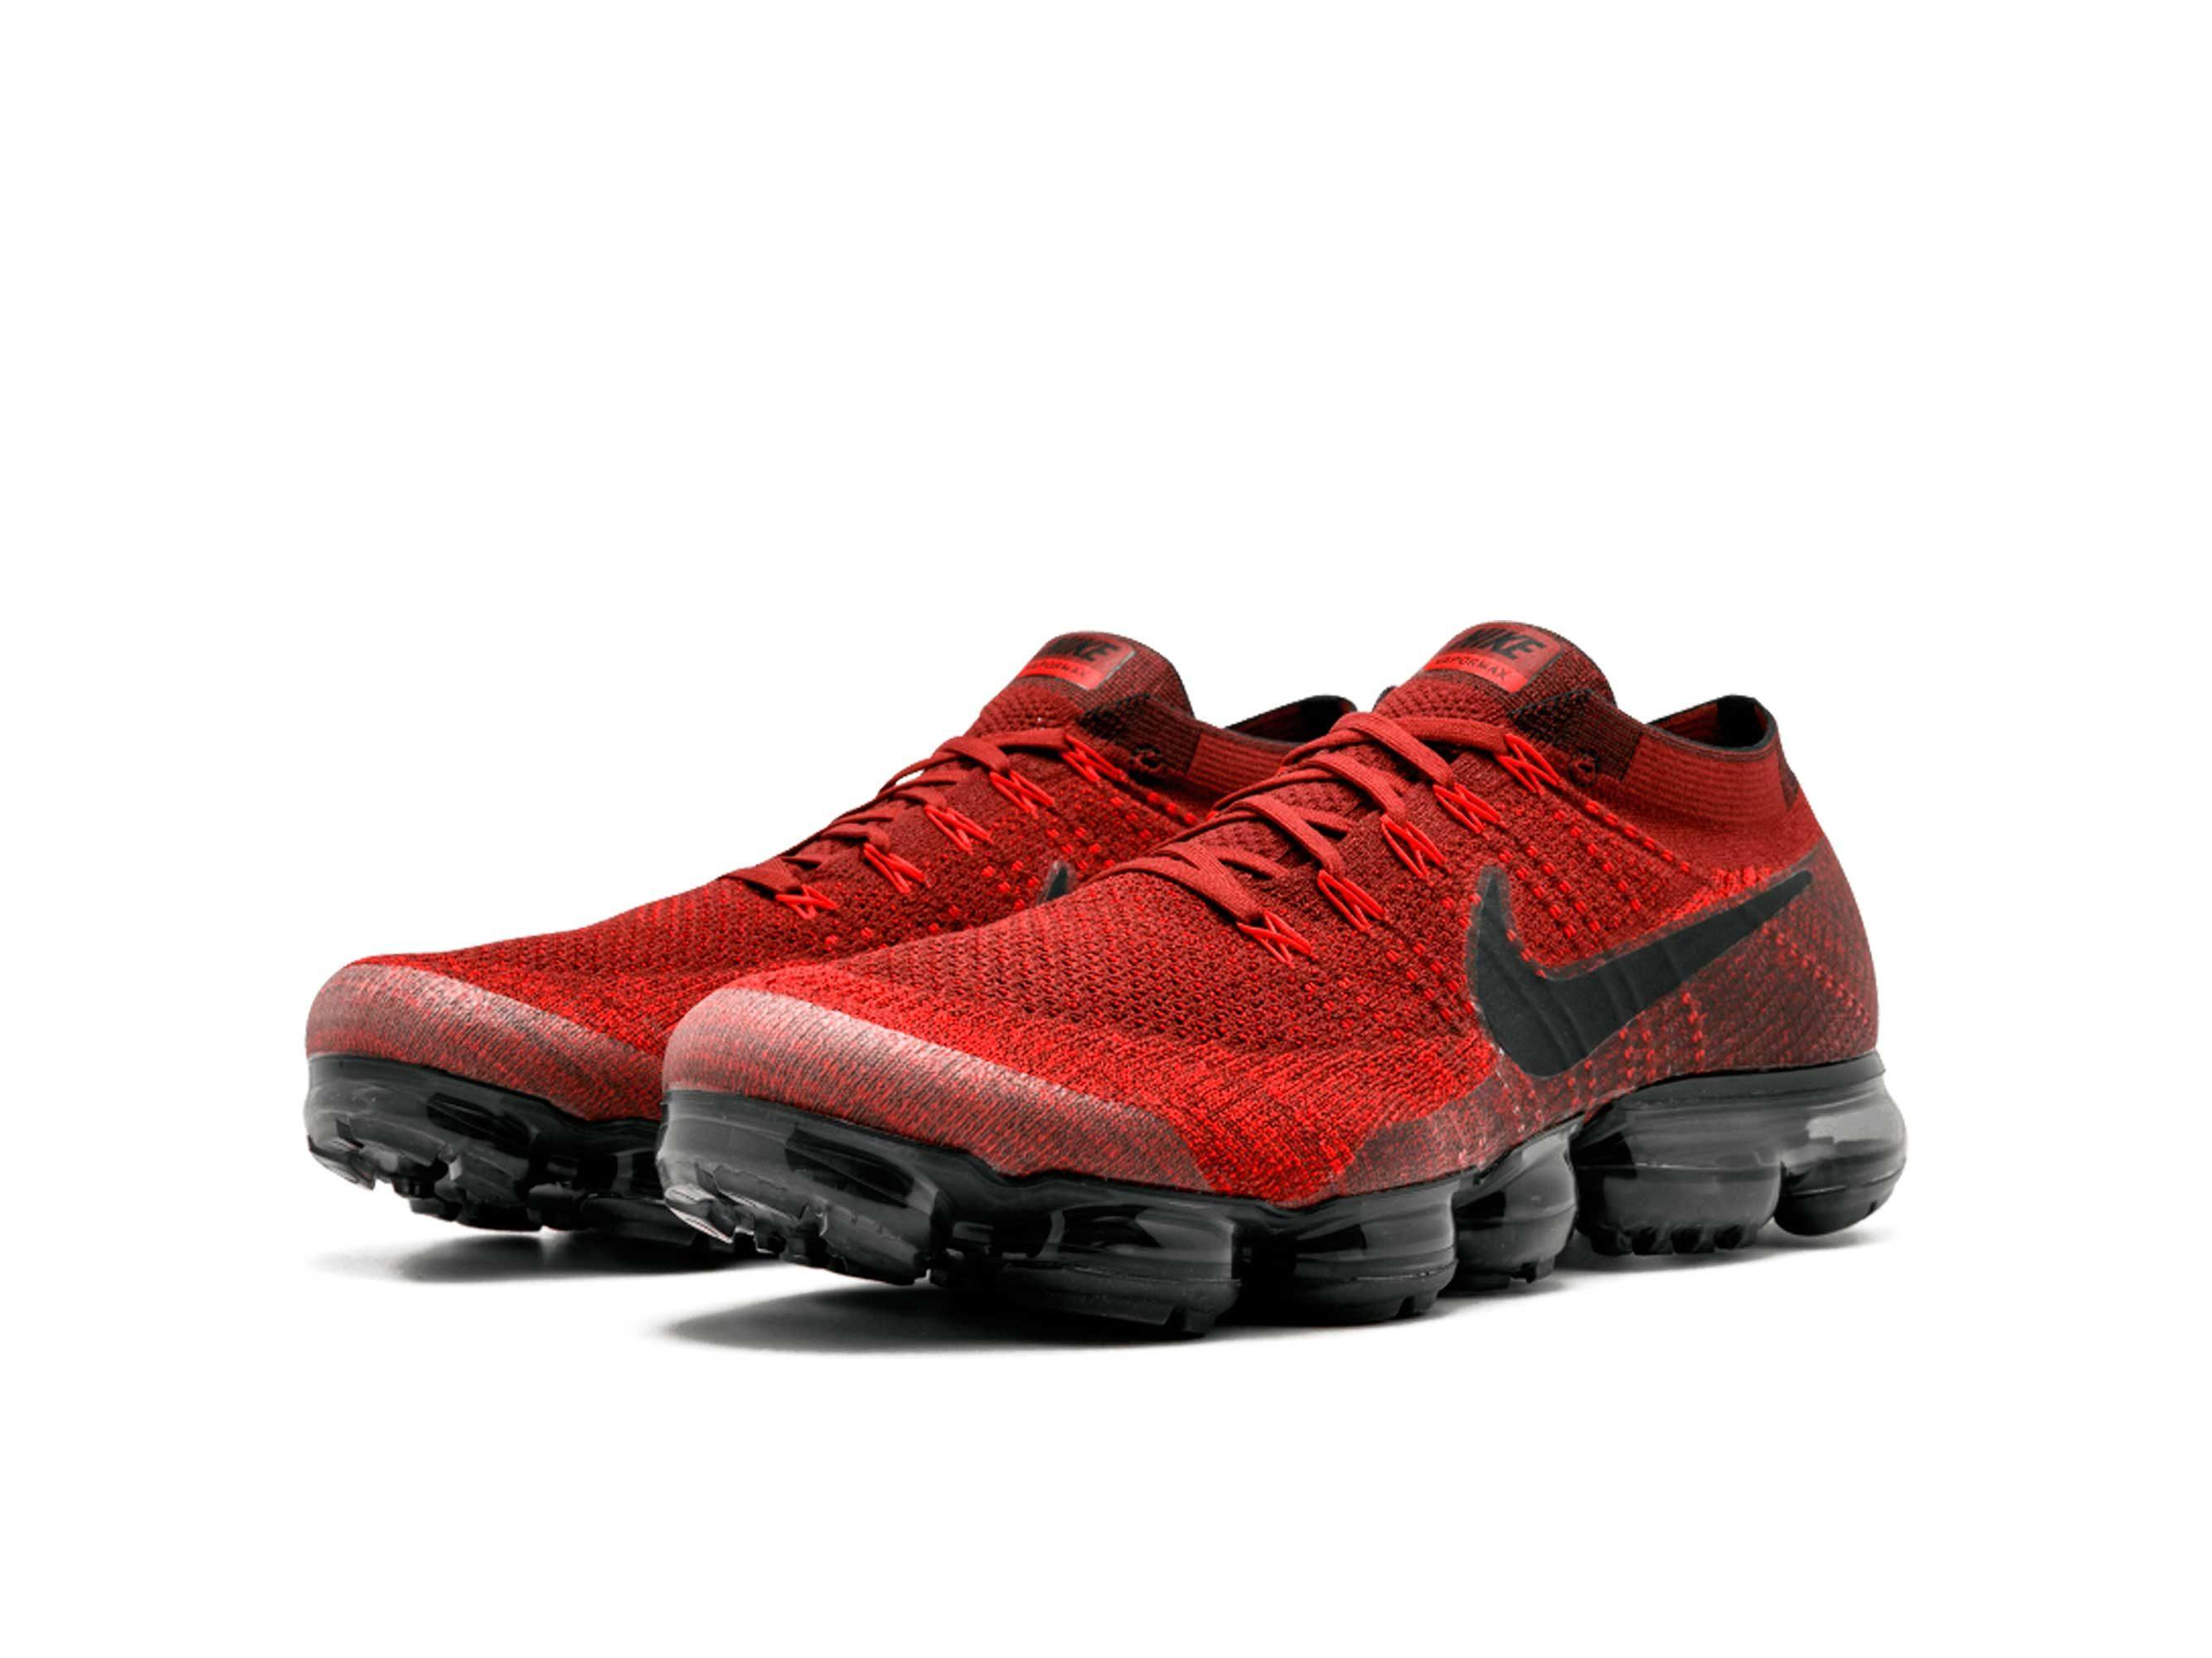 nike air vapormax flyknit dark team red black 849558_601 купить